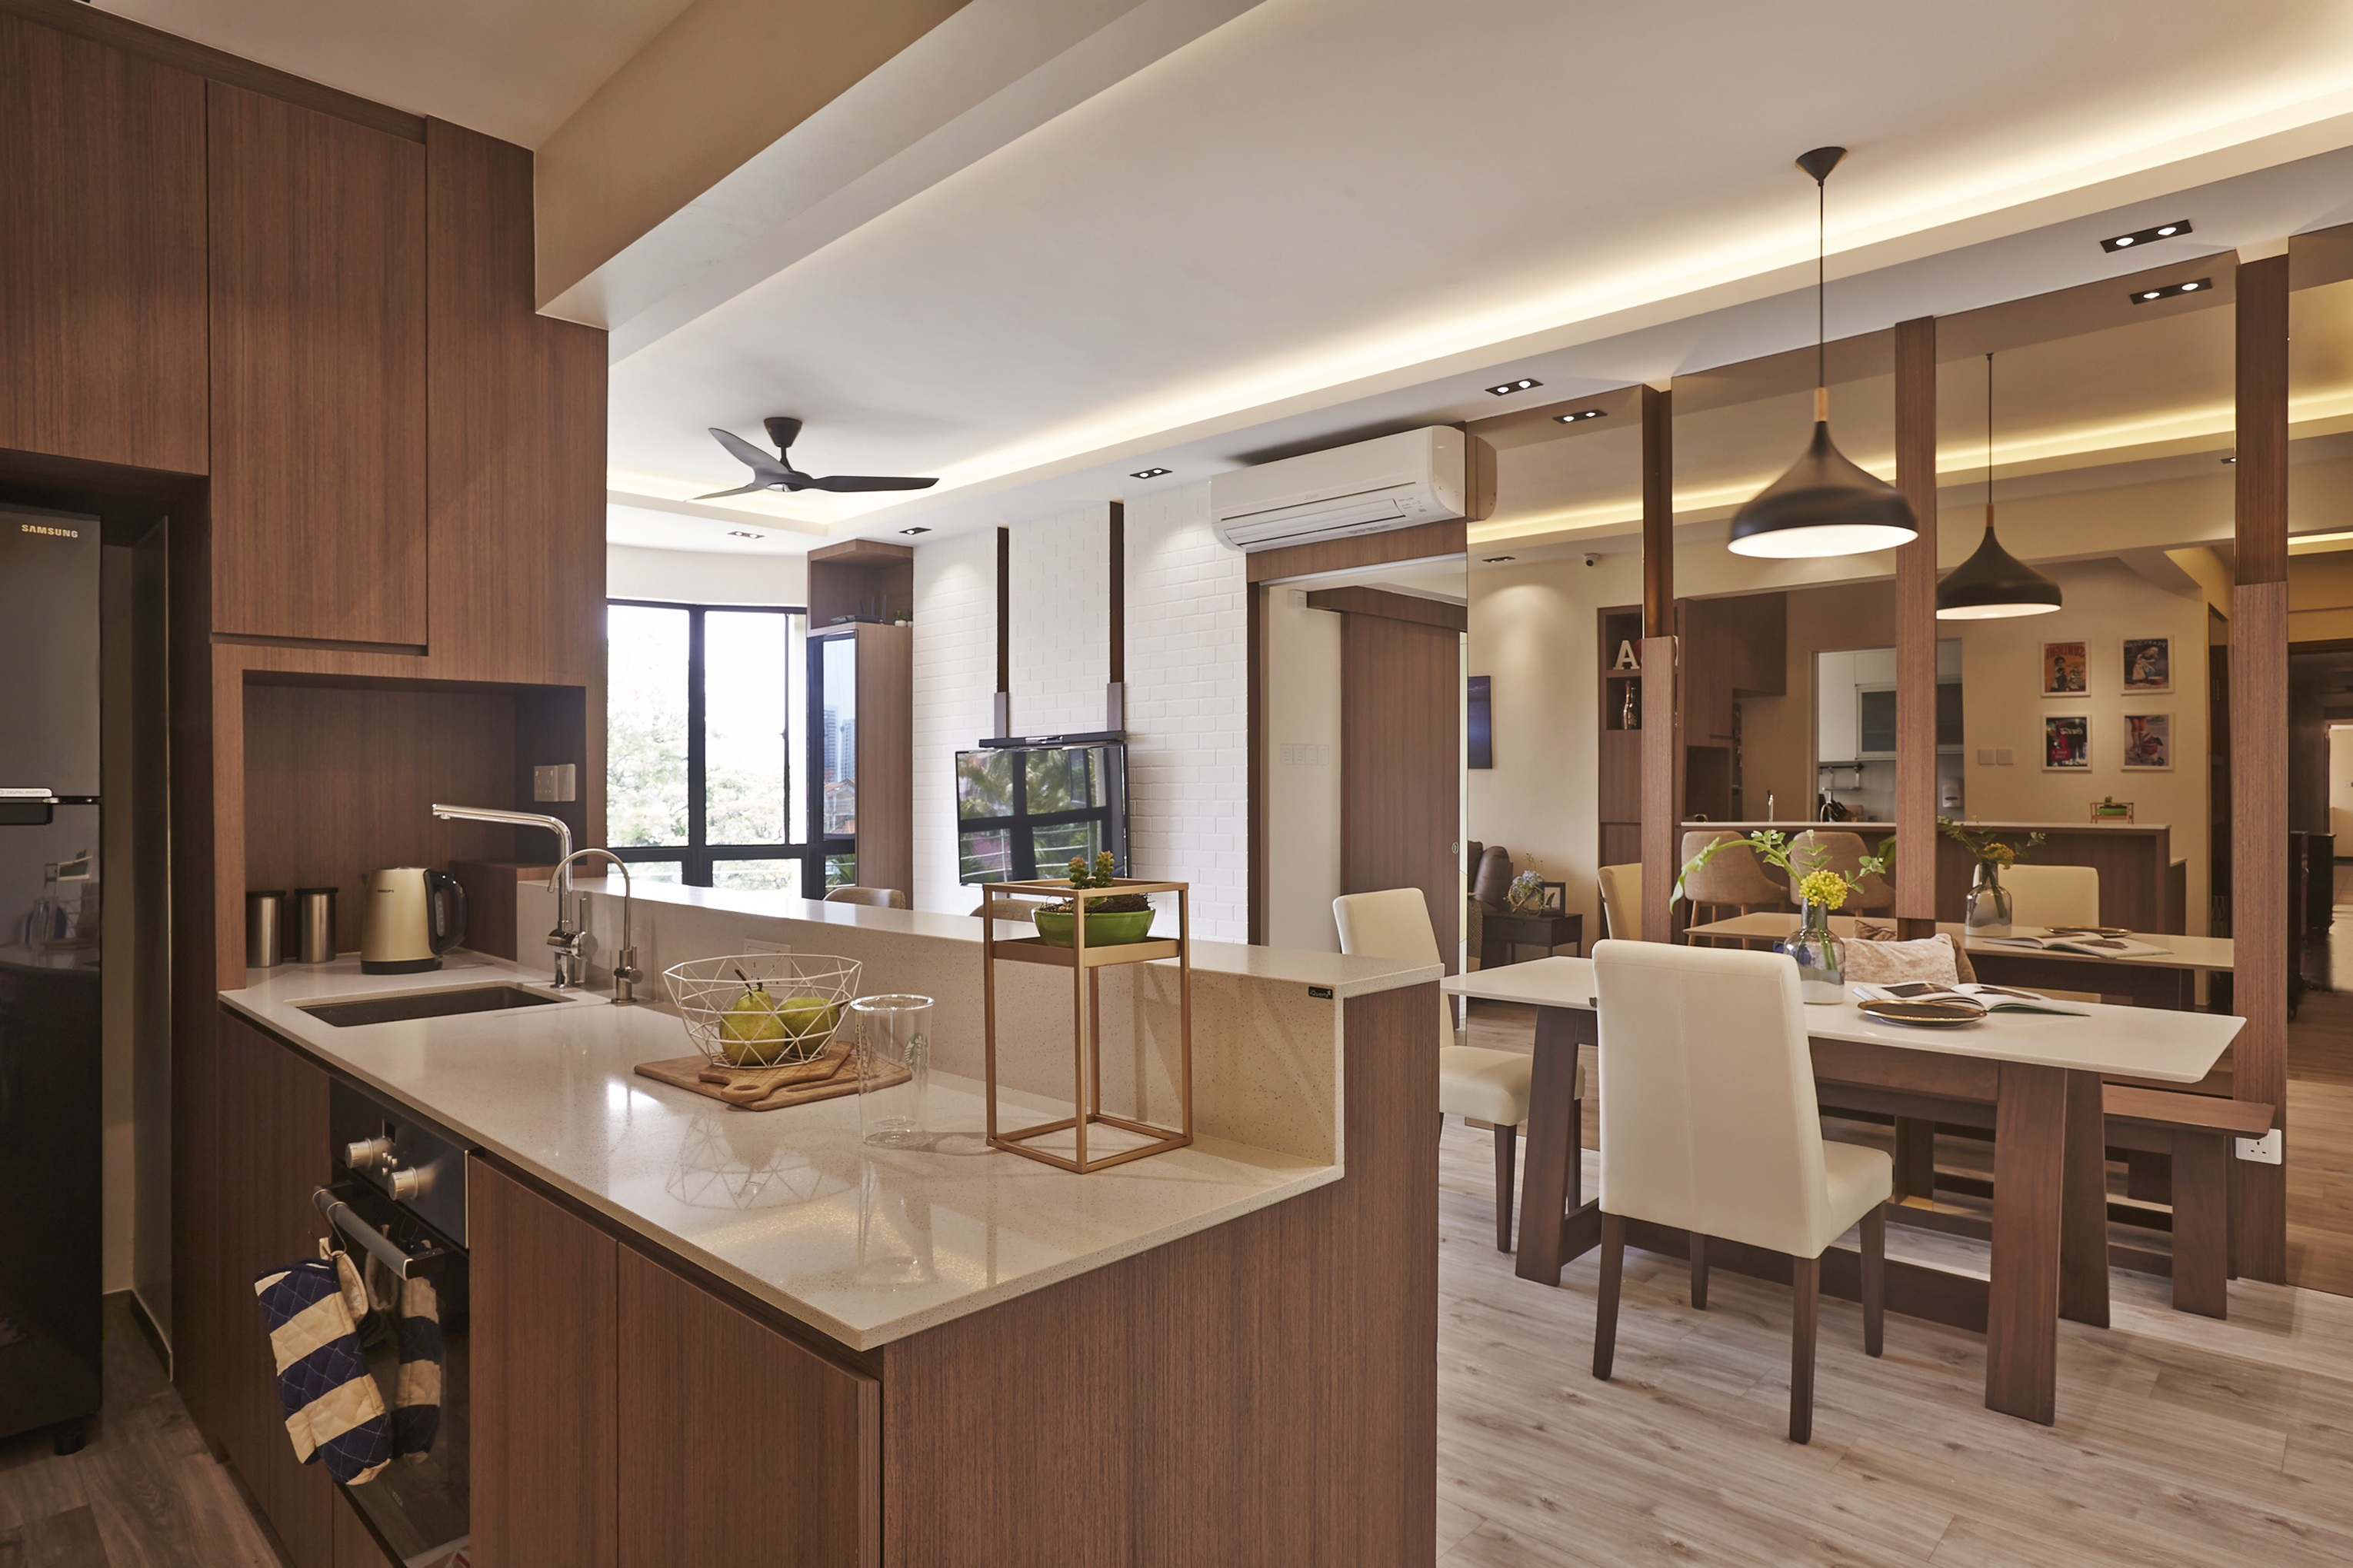 6 Design Ideas On A Small Budget Home Living